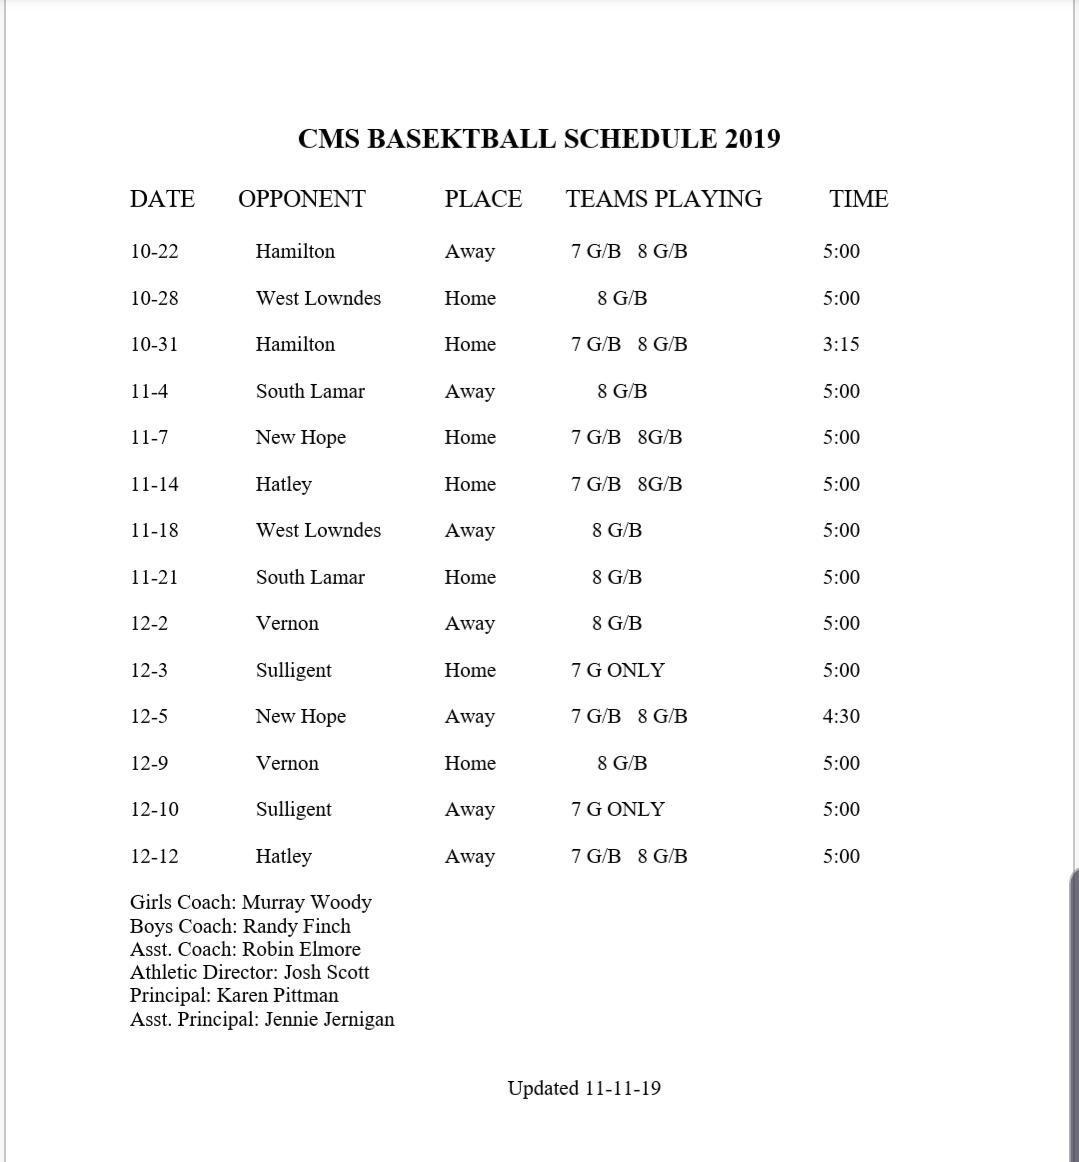 CMS Basketball 2019